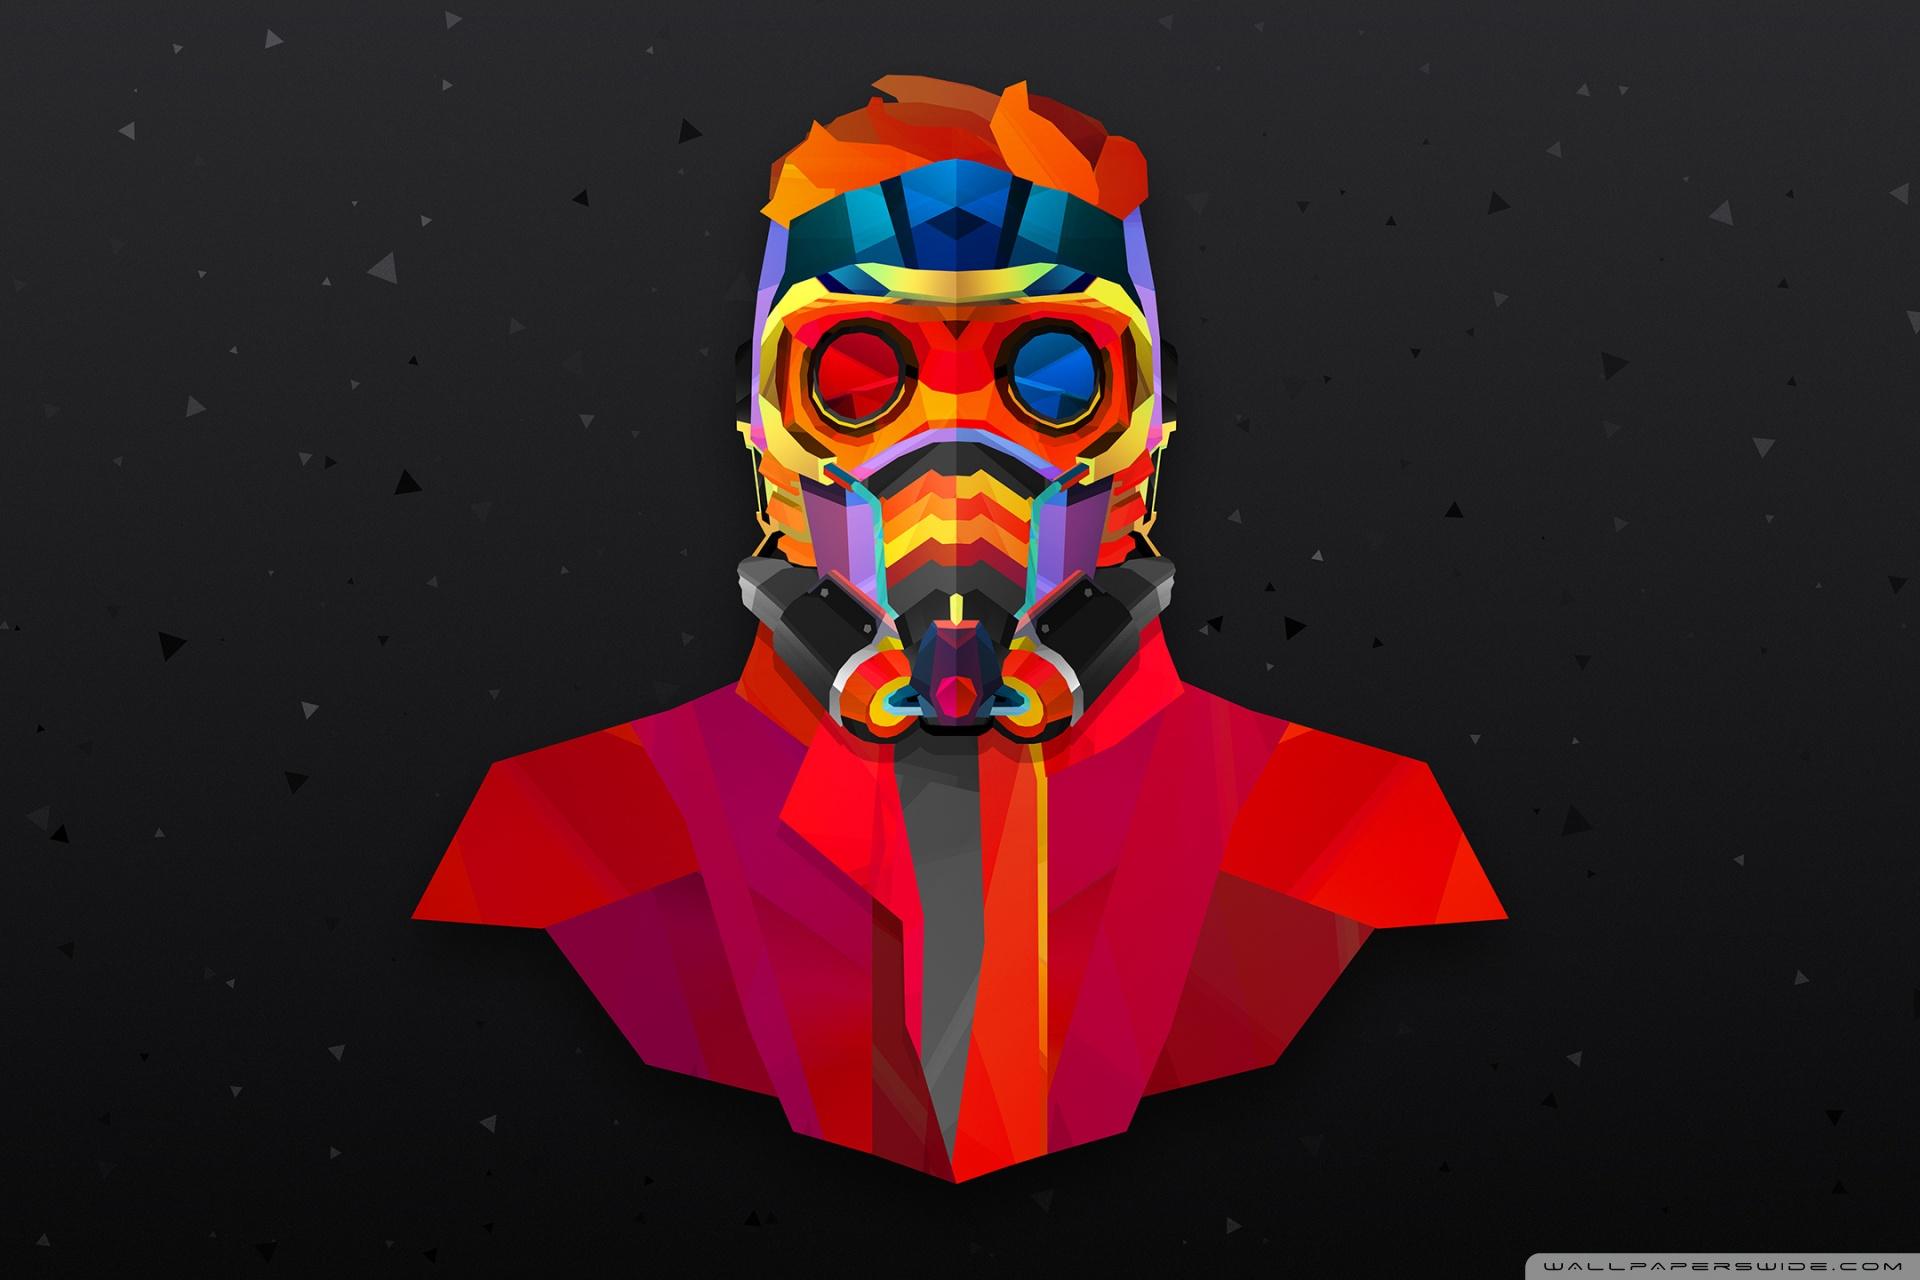 1920x1280 Guardians Of The Galaxy Star Lord Abstract Art 4k Hd Desktop